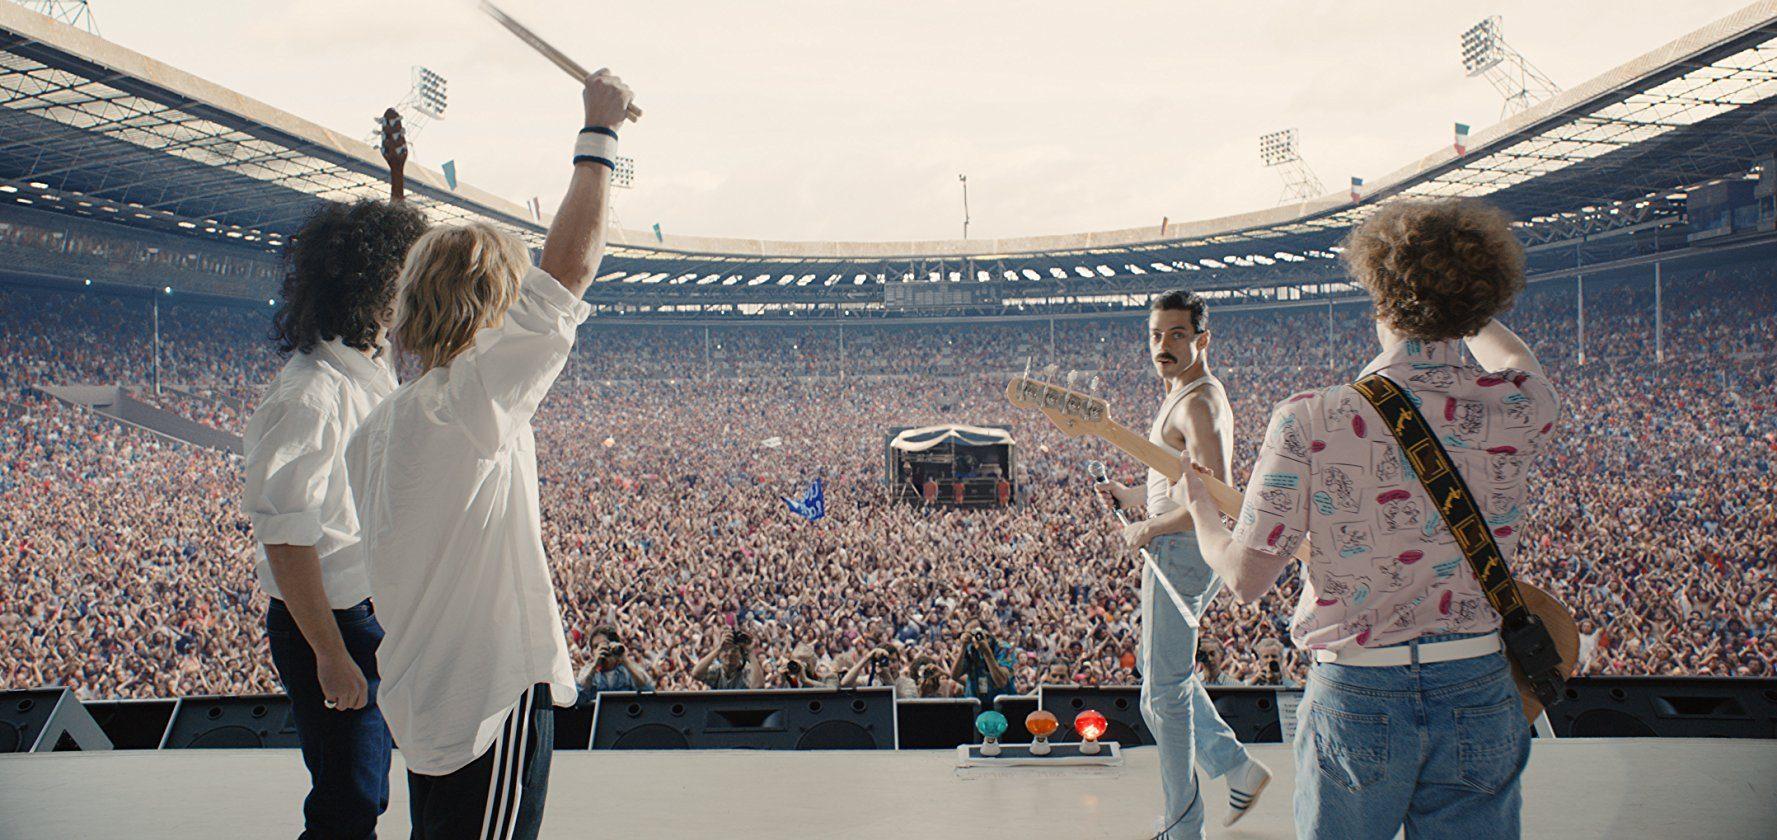 Rami Malek as Freddie Mercury in Bohemian Rhapsody, music movies